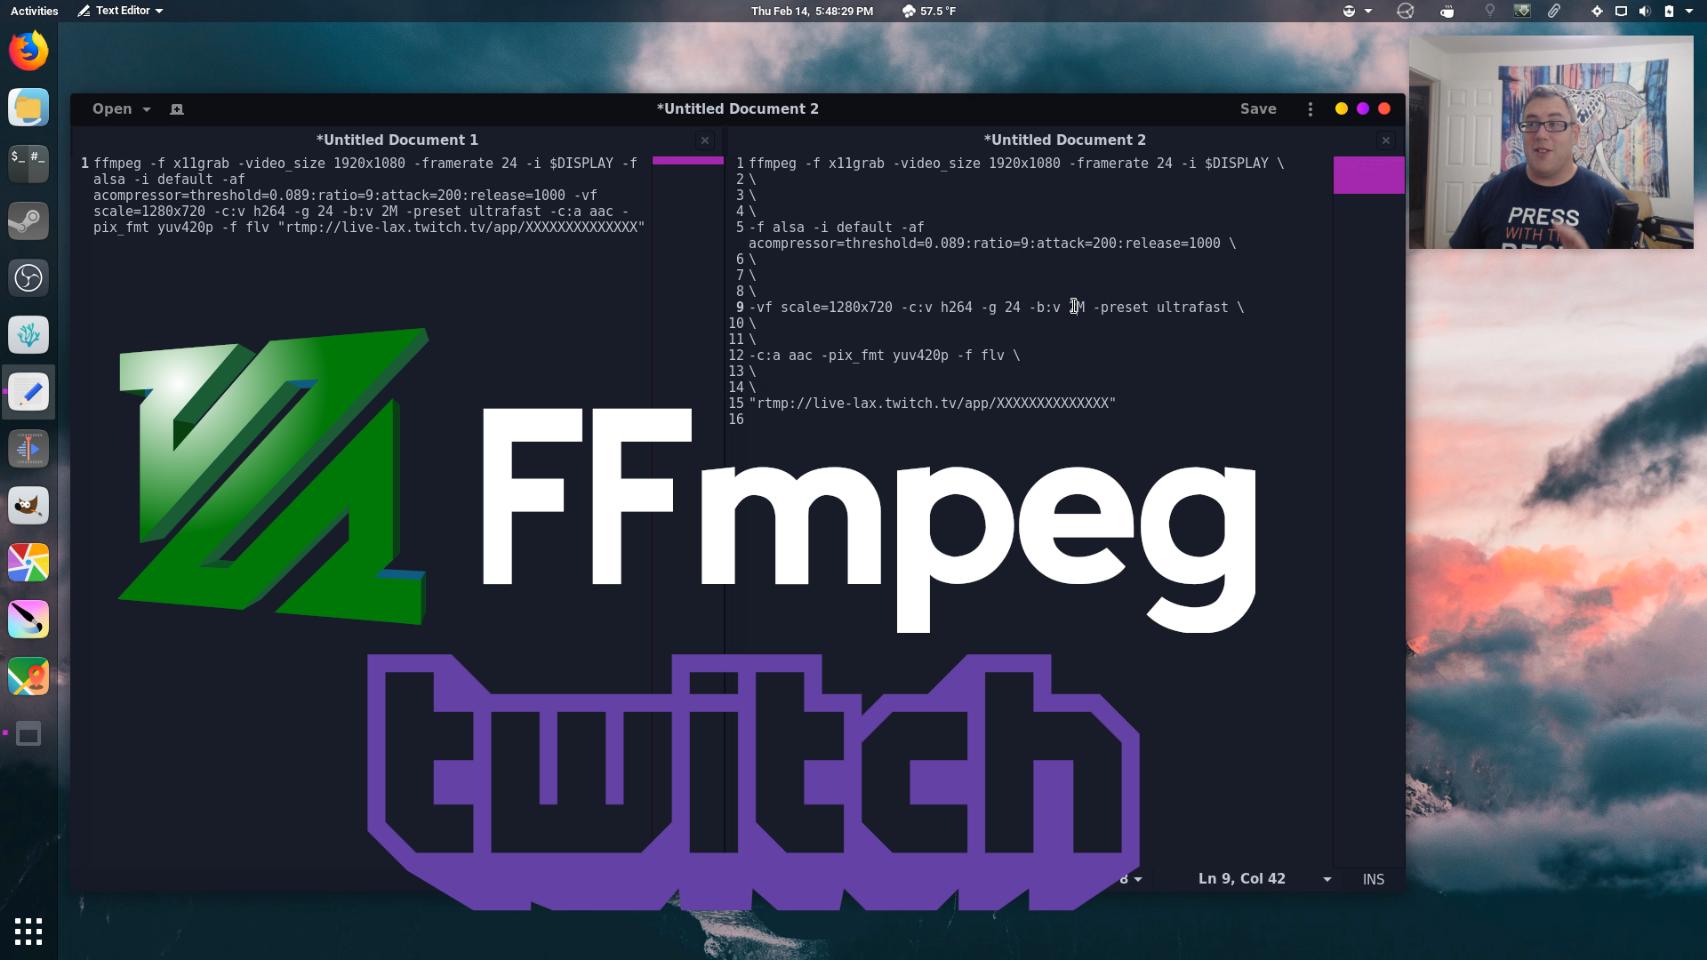 ffmpeg - Moosetodon